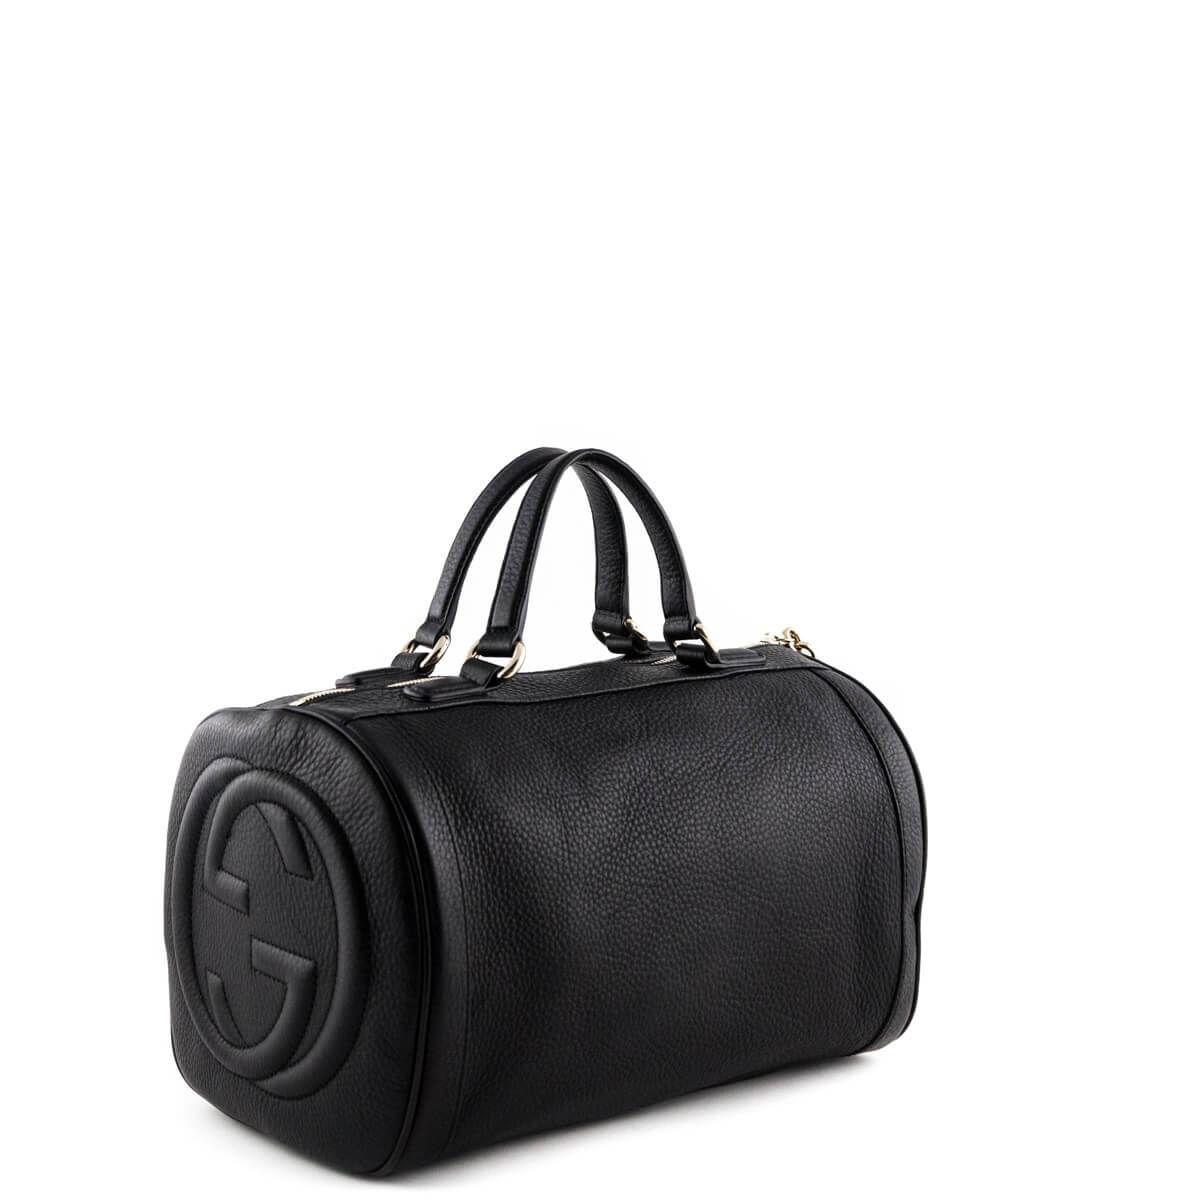 bfe114c1f5c Gucci Black Soho Medium Boston Bag - LOVE that BAG - Preowned Authentic  Designer Handbags